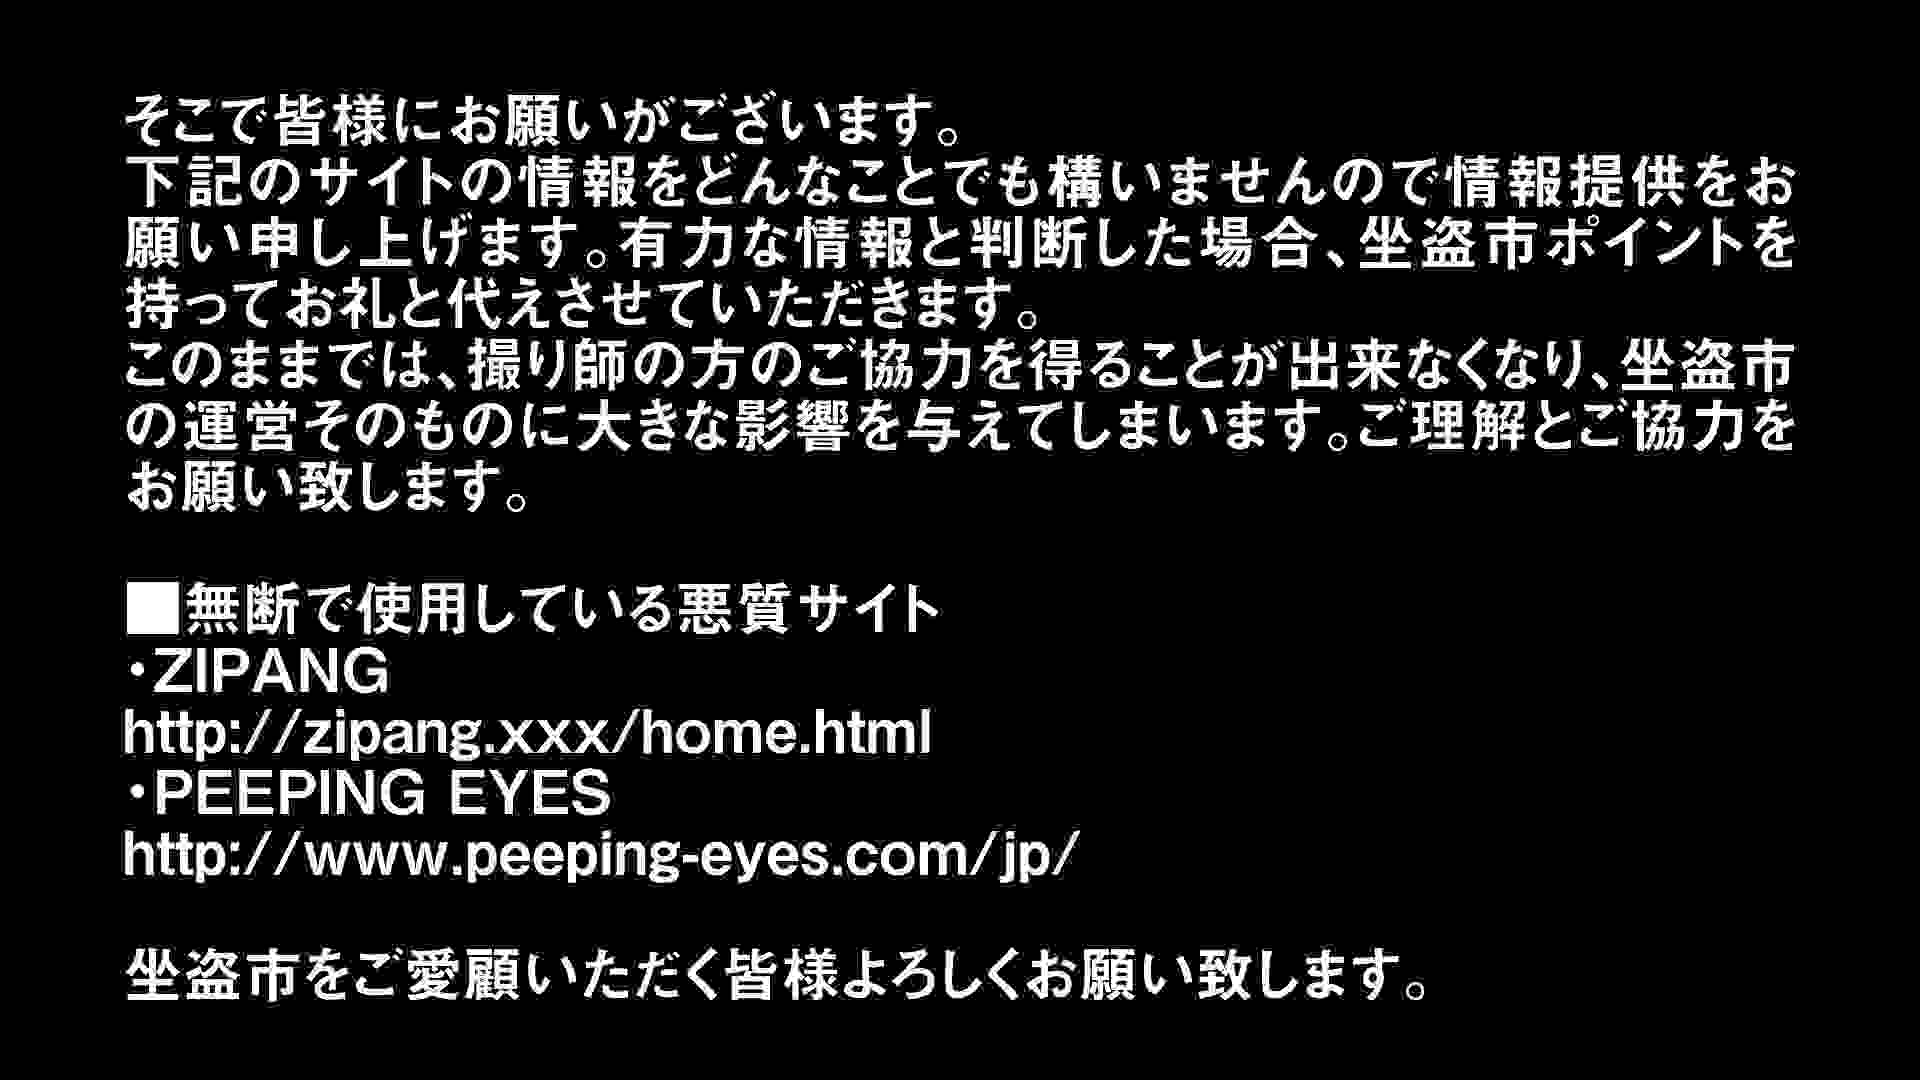 Aquaな露天風呂Vol.297 女体盗撮   OL女体  91連発 34